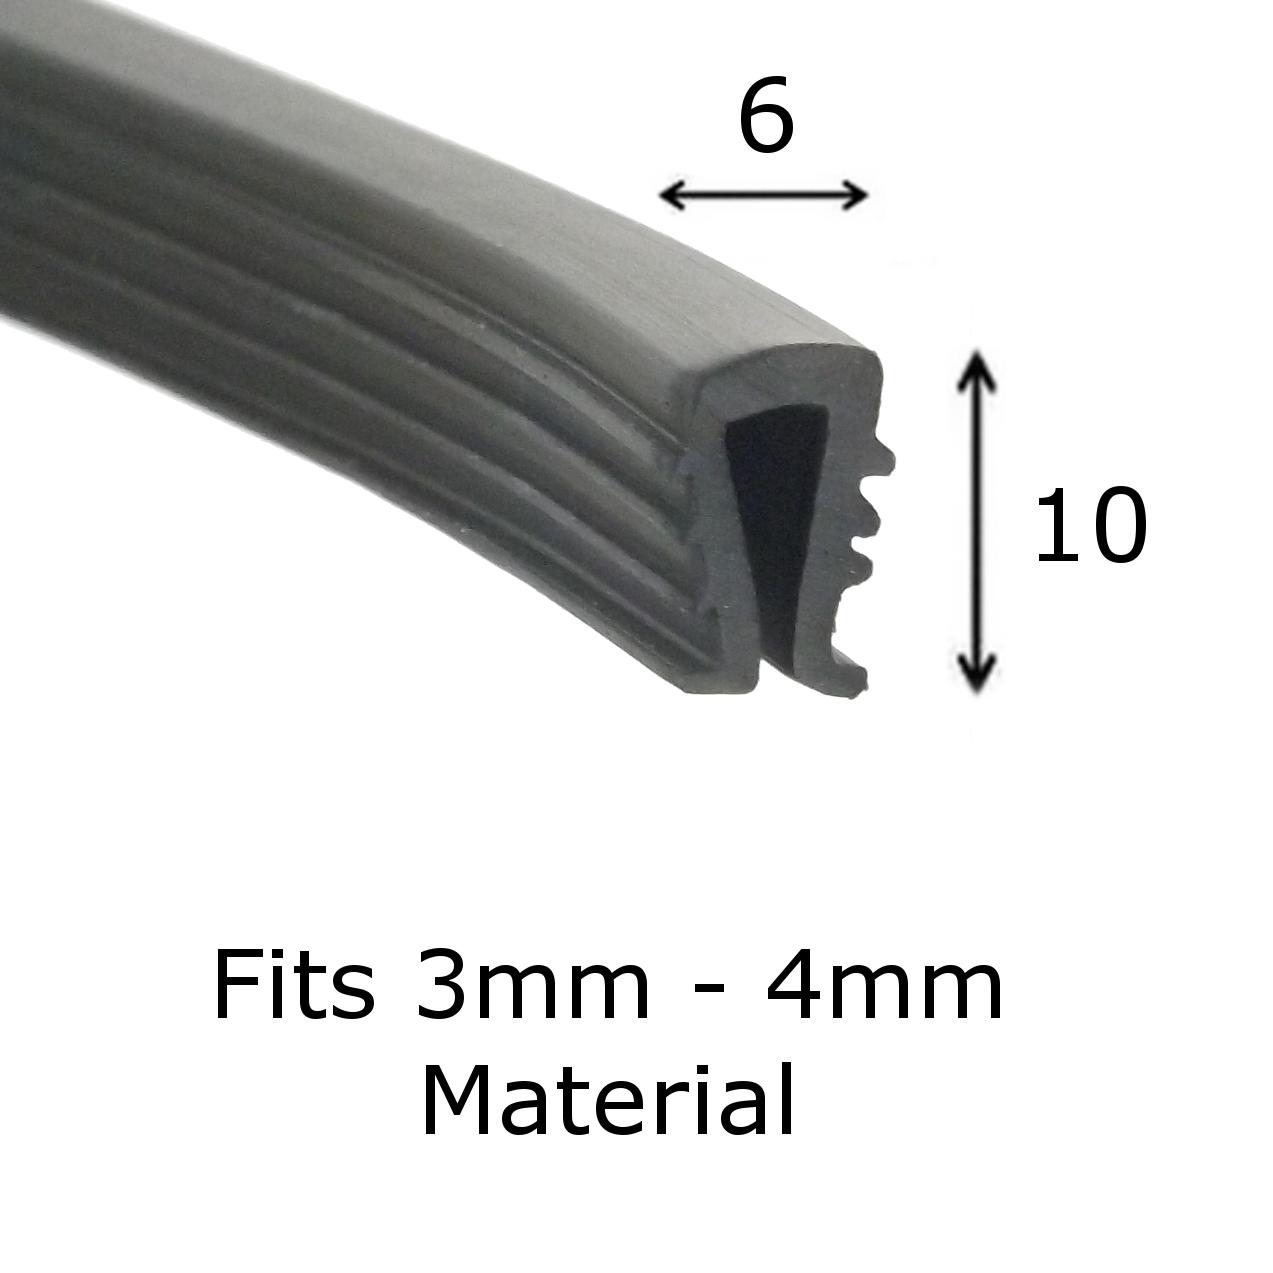 Black Rubber U Channel Edging Trim Seal 10mm x 4mm